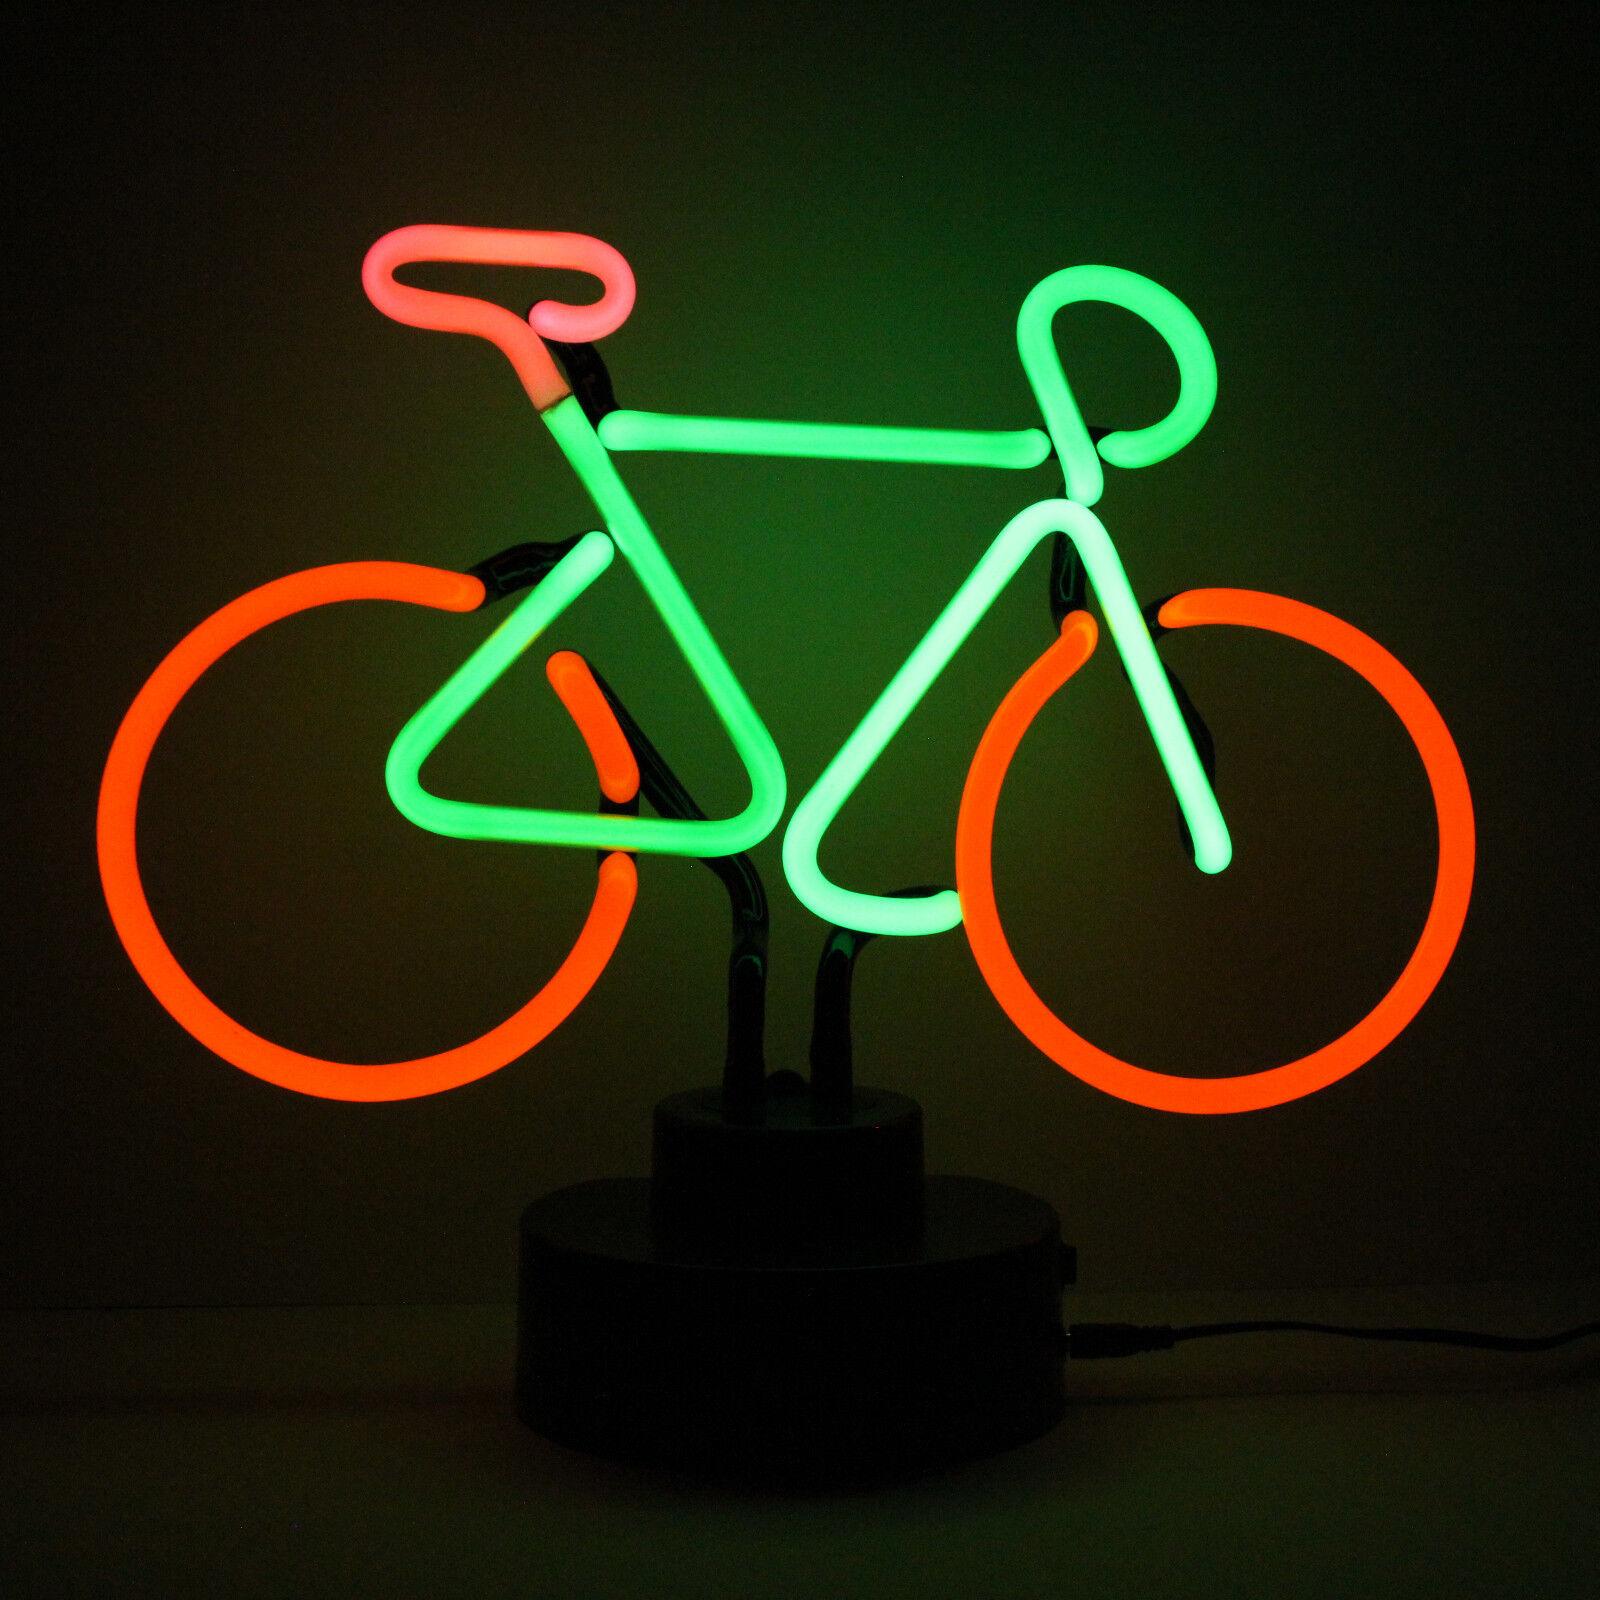 BICYCLE Neon Sculpture Bike Shop AdGrünising Display Sign Table Lamp Shelf Light